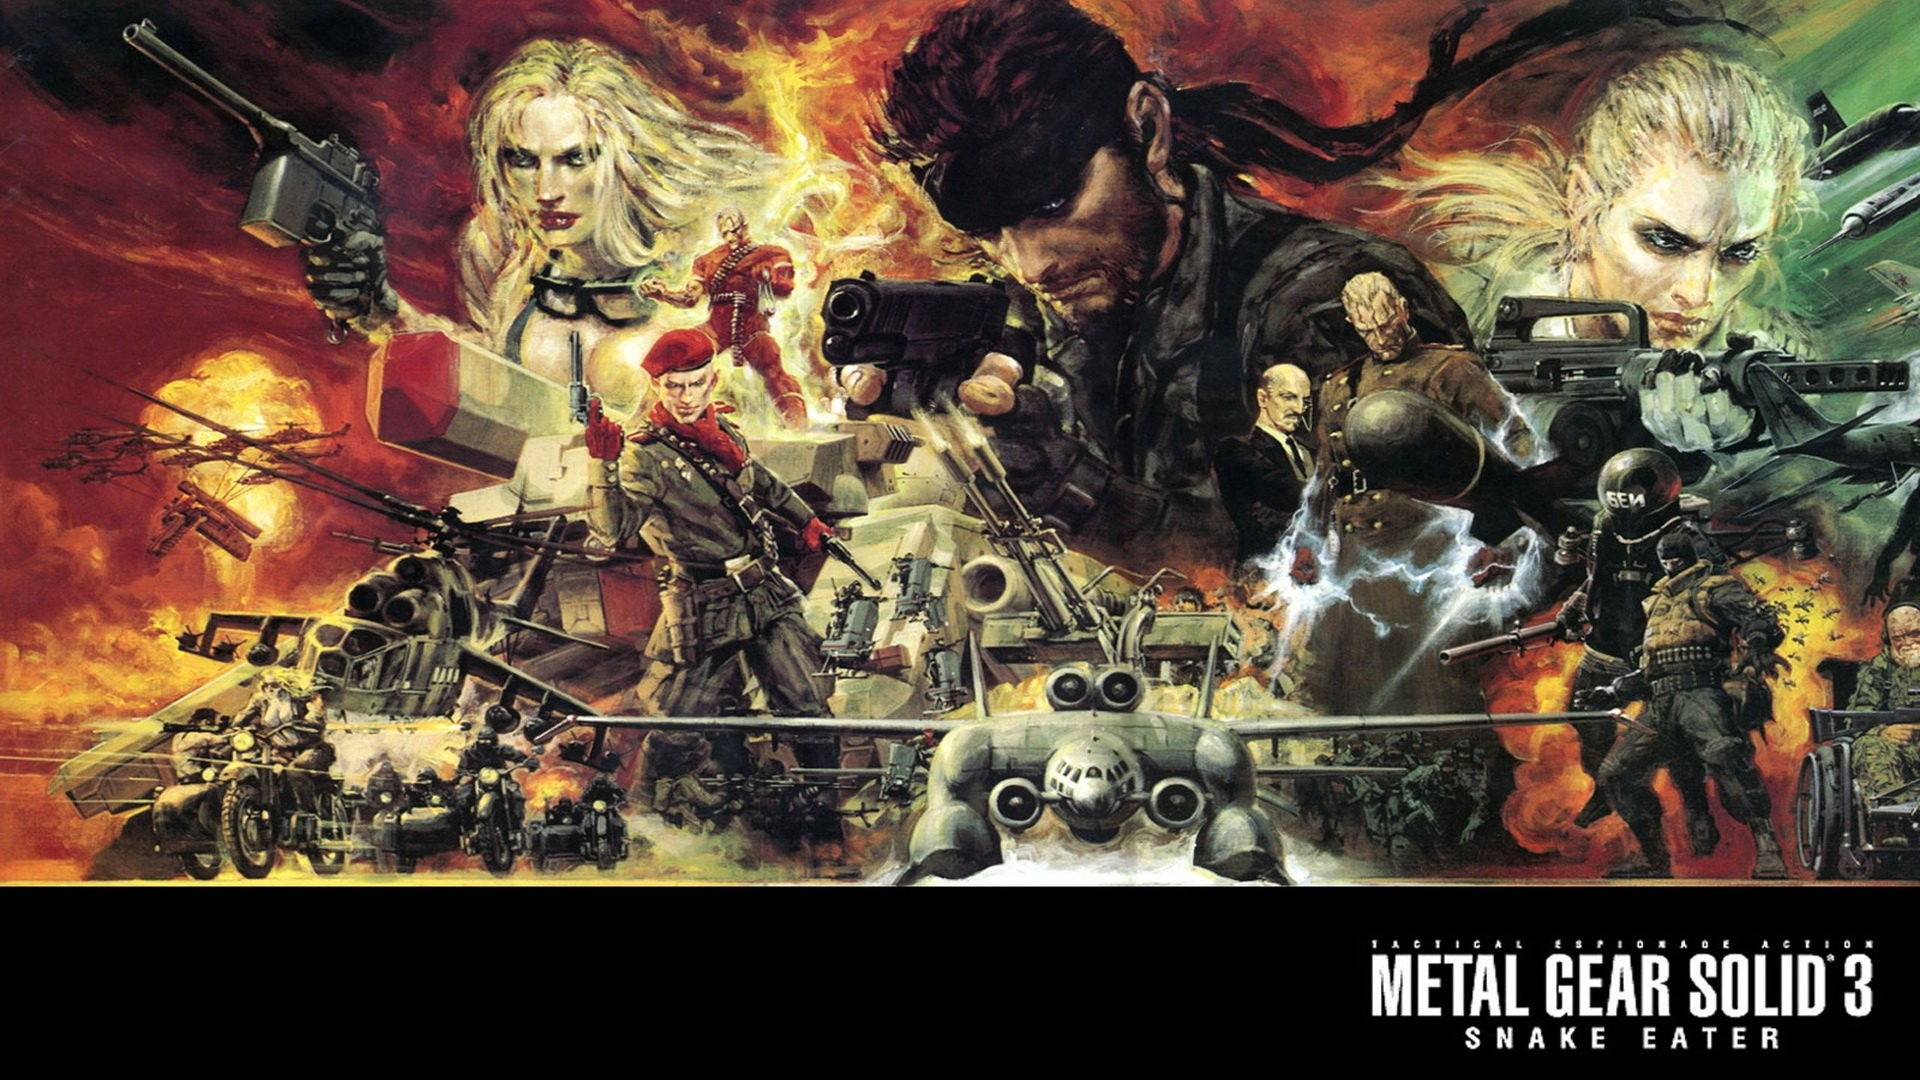 72 Metal Gear Solid Wallpaper 1080p